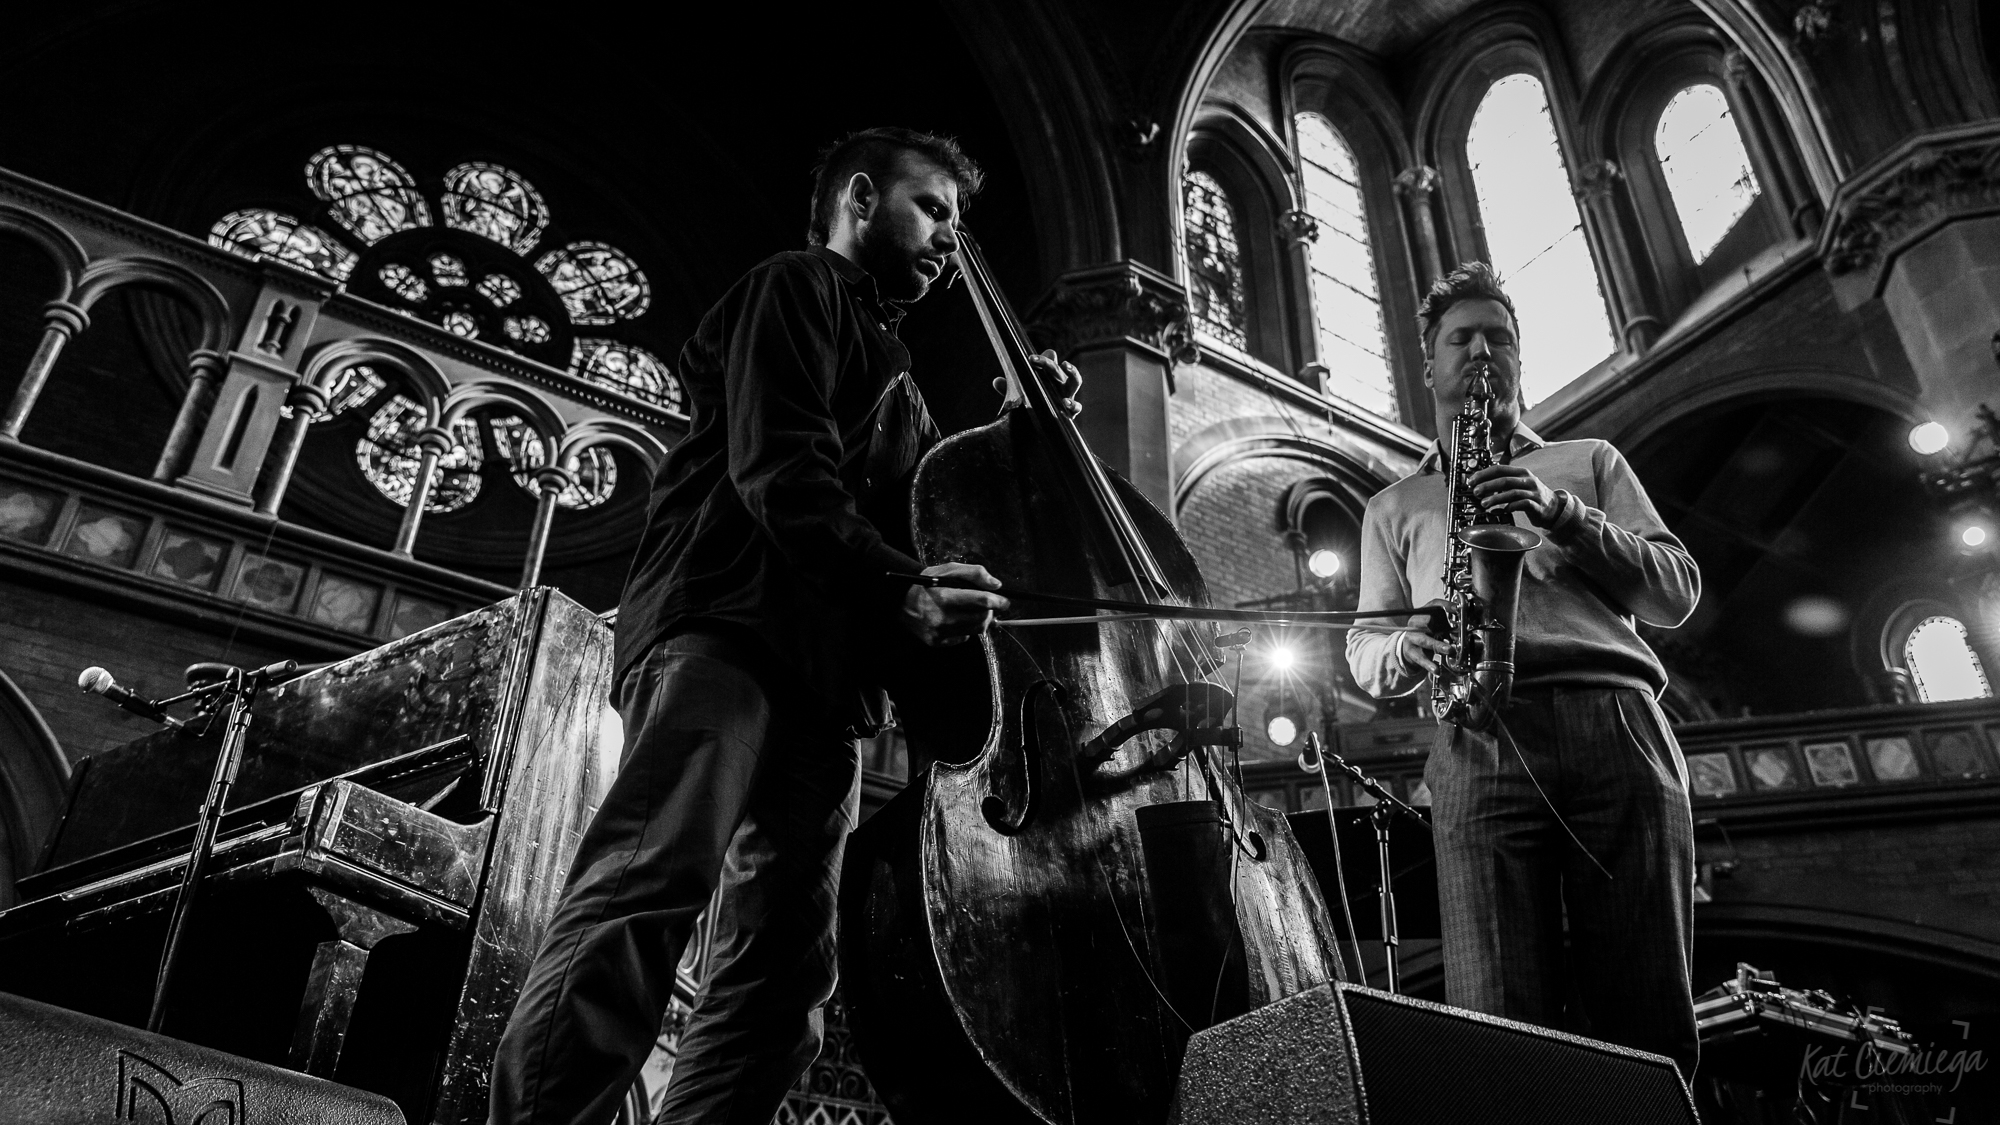 Kat Ciemiega Photography, Daylight Music, Guido Spannocchi, Thodoris Ziarkas, concert photographer, event photographer, live music, photographer London, music London, saxophone, double bass